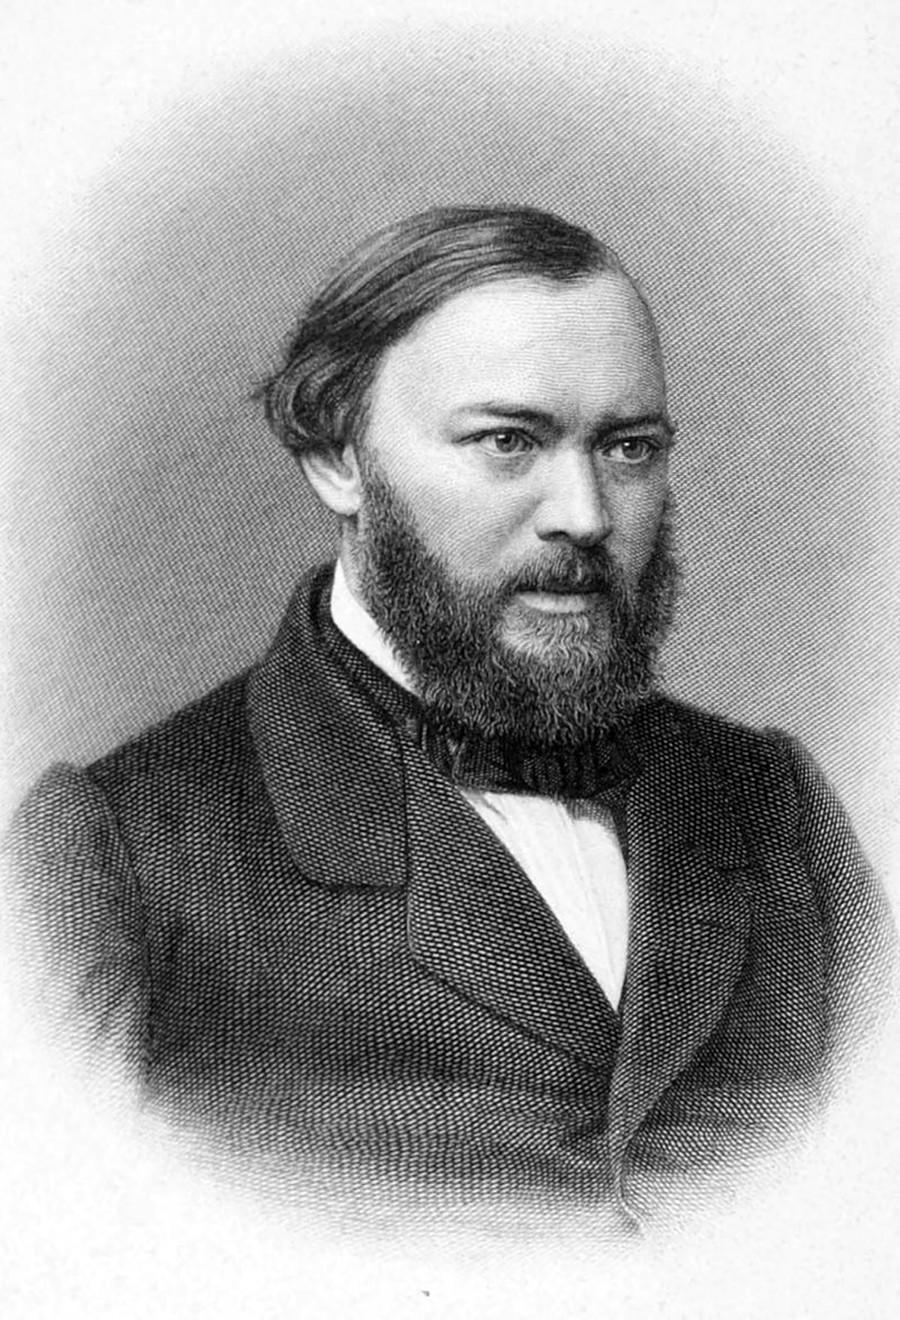 Alexander Ostrowski